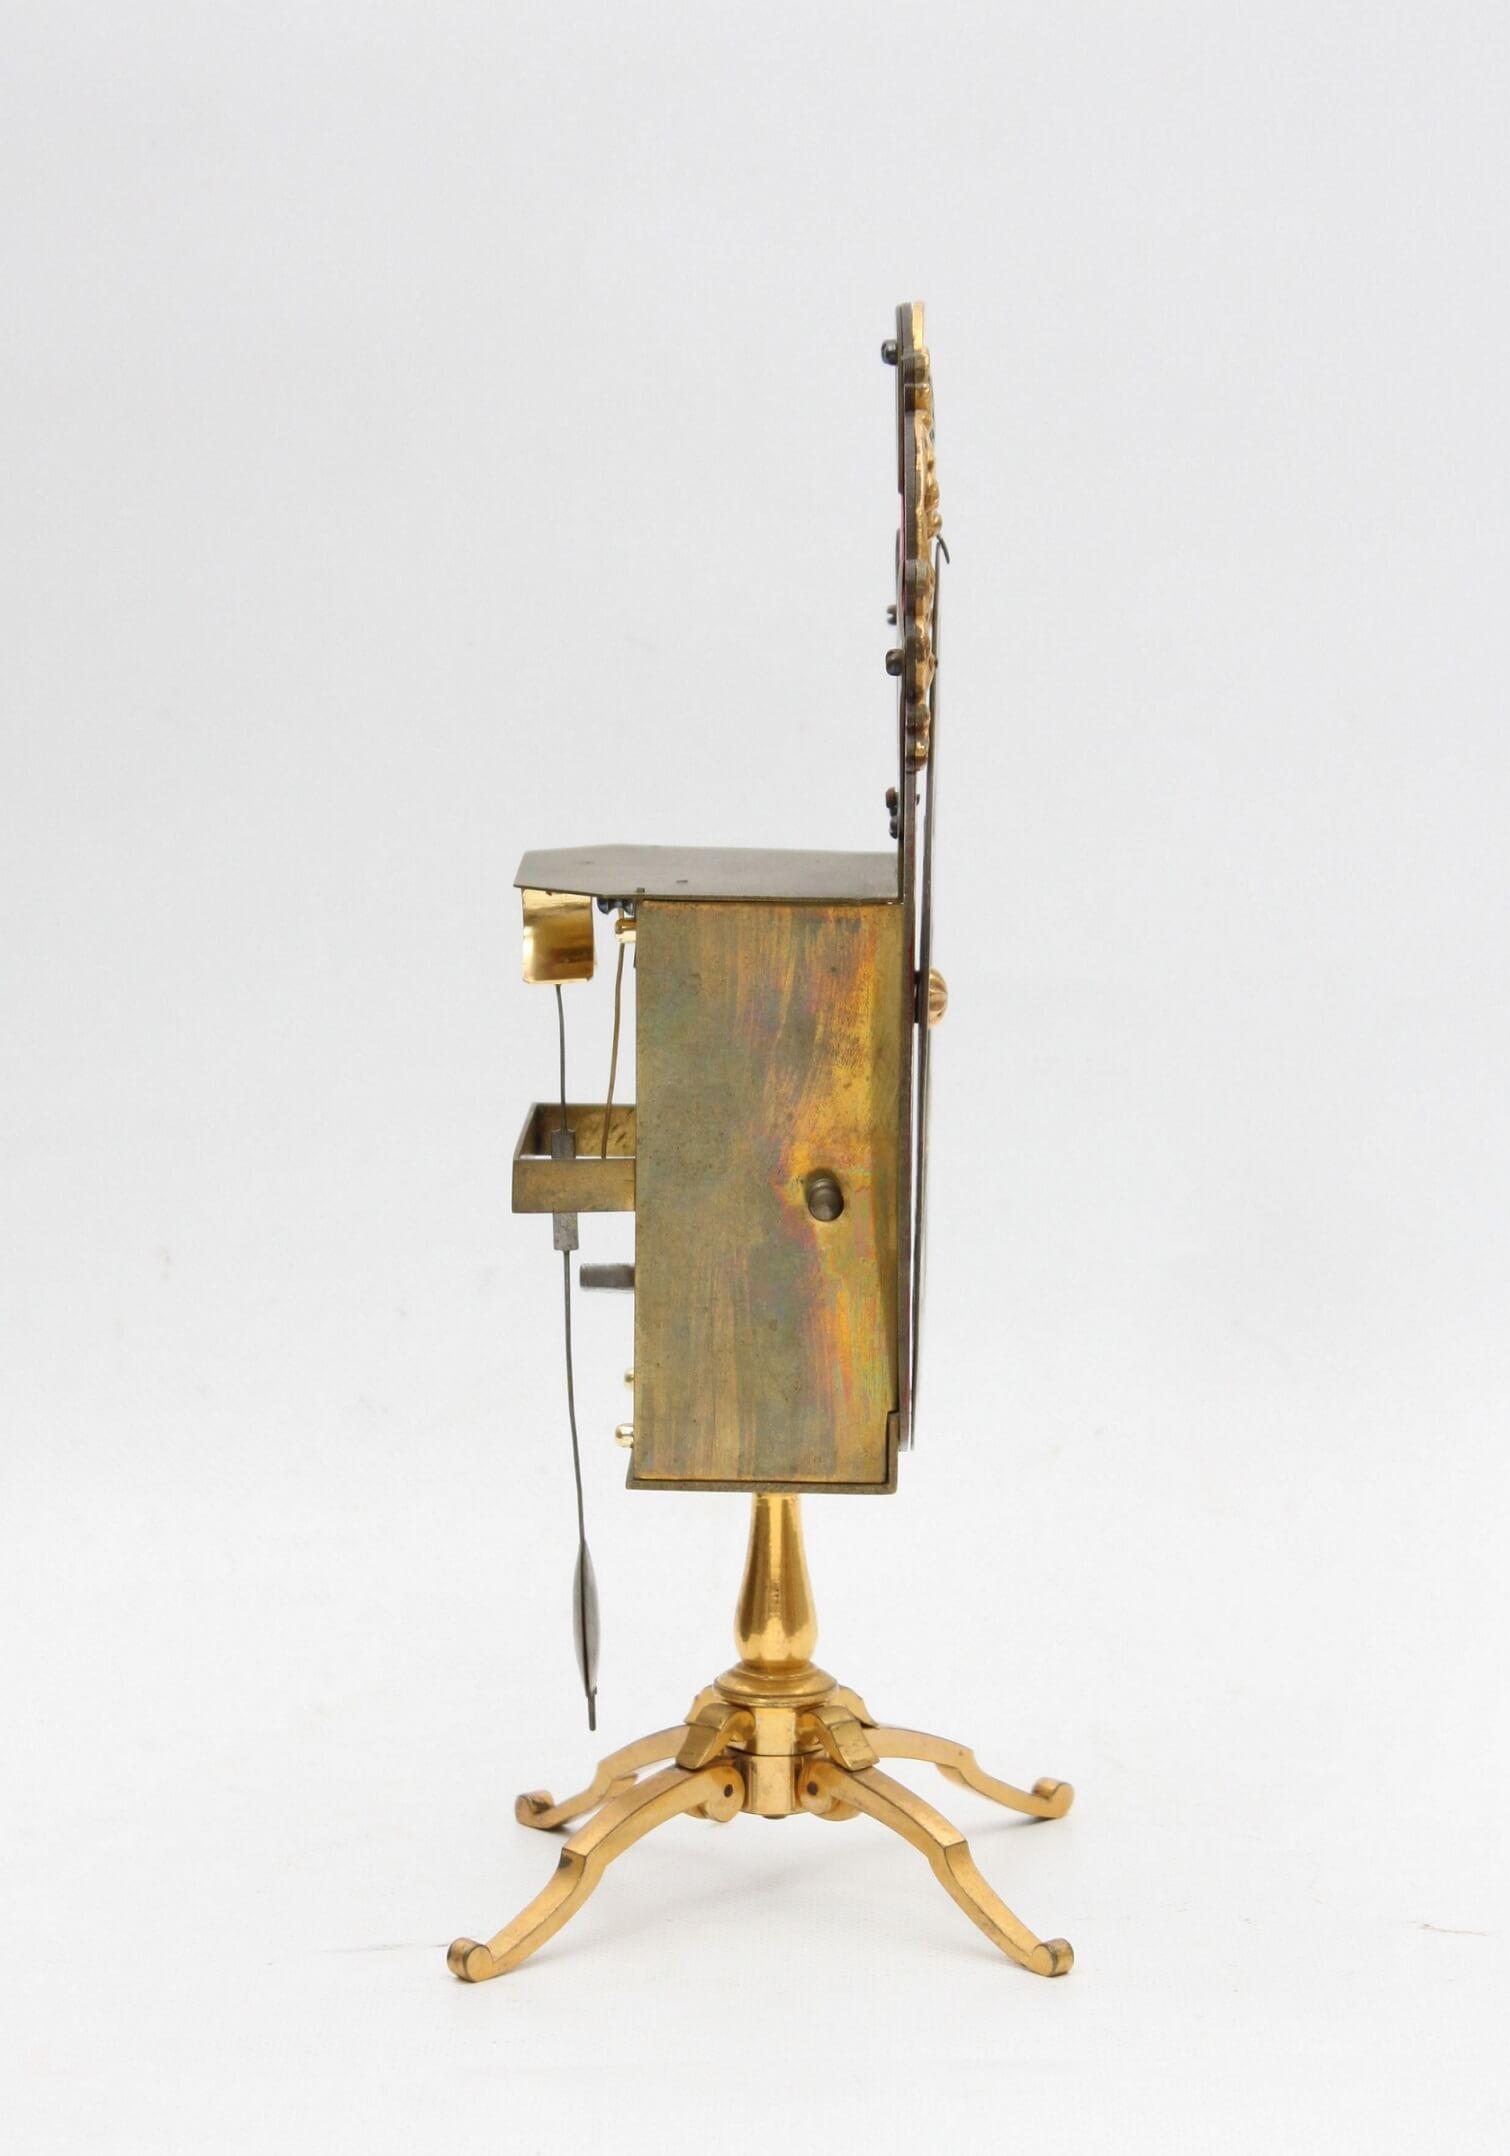 Swiss-night Clock-antique Clock-Basel-brass-Regence-J.J. Zeller